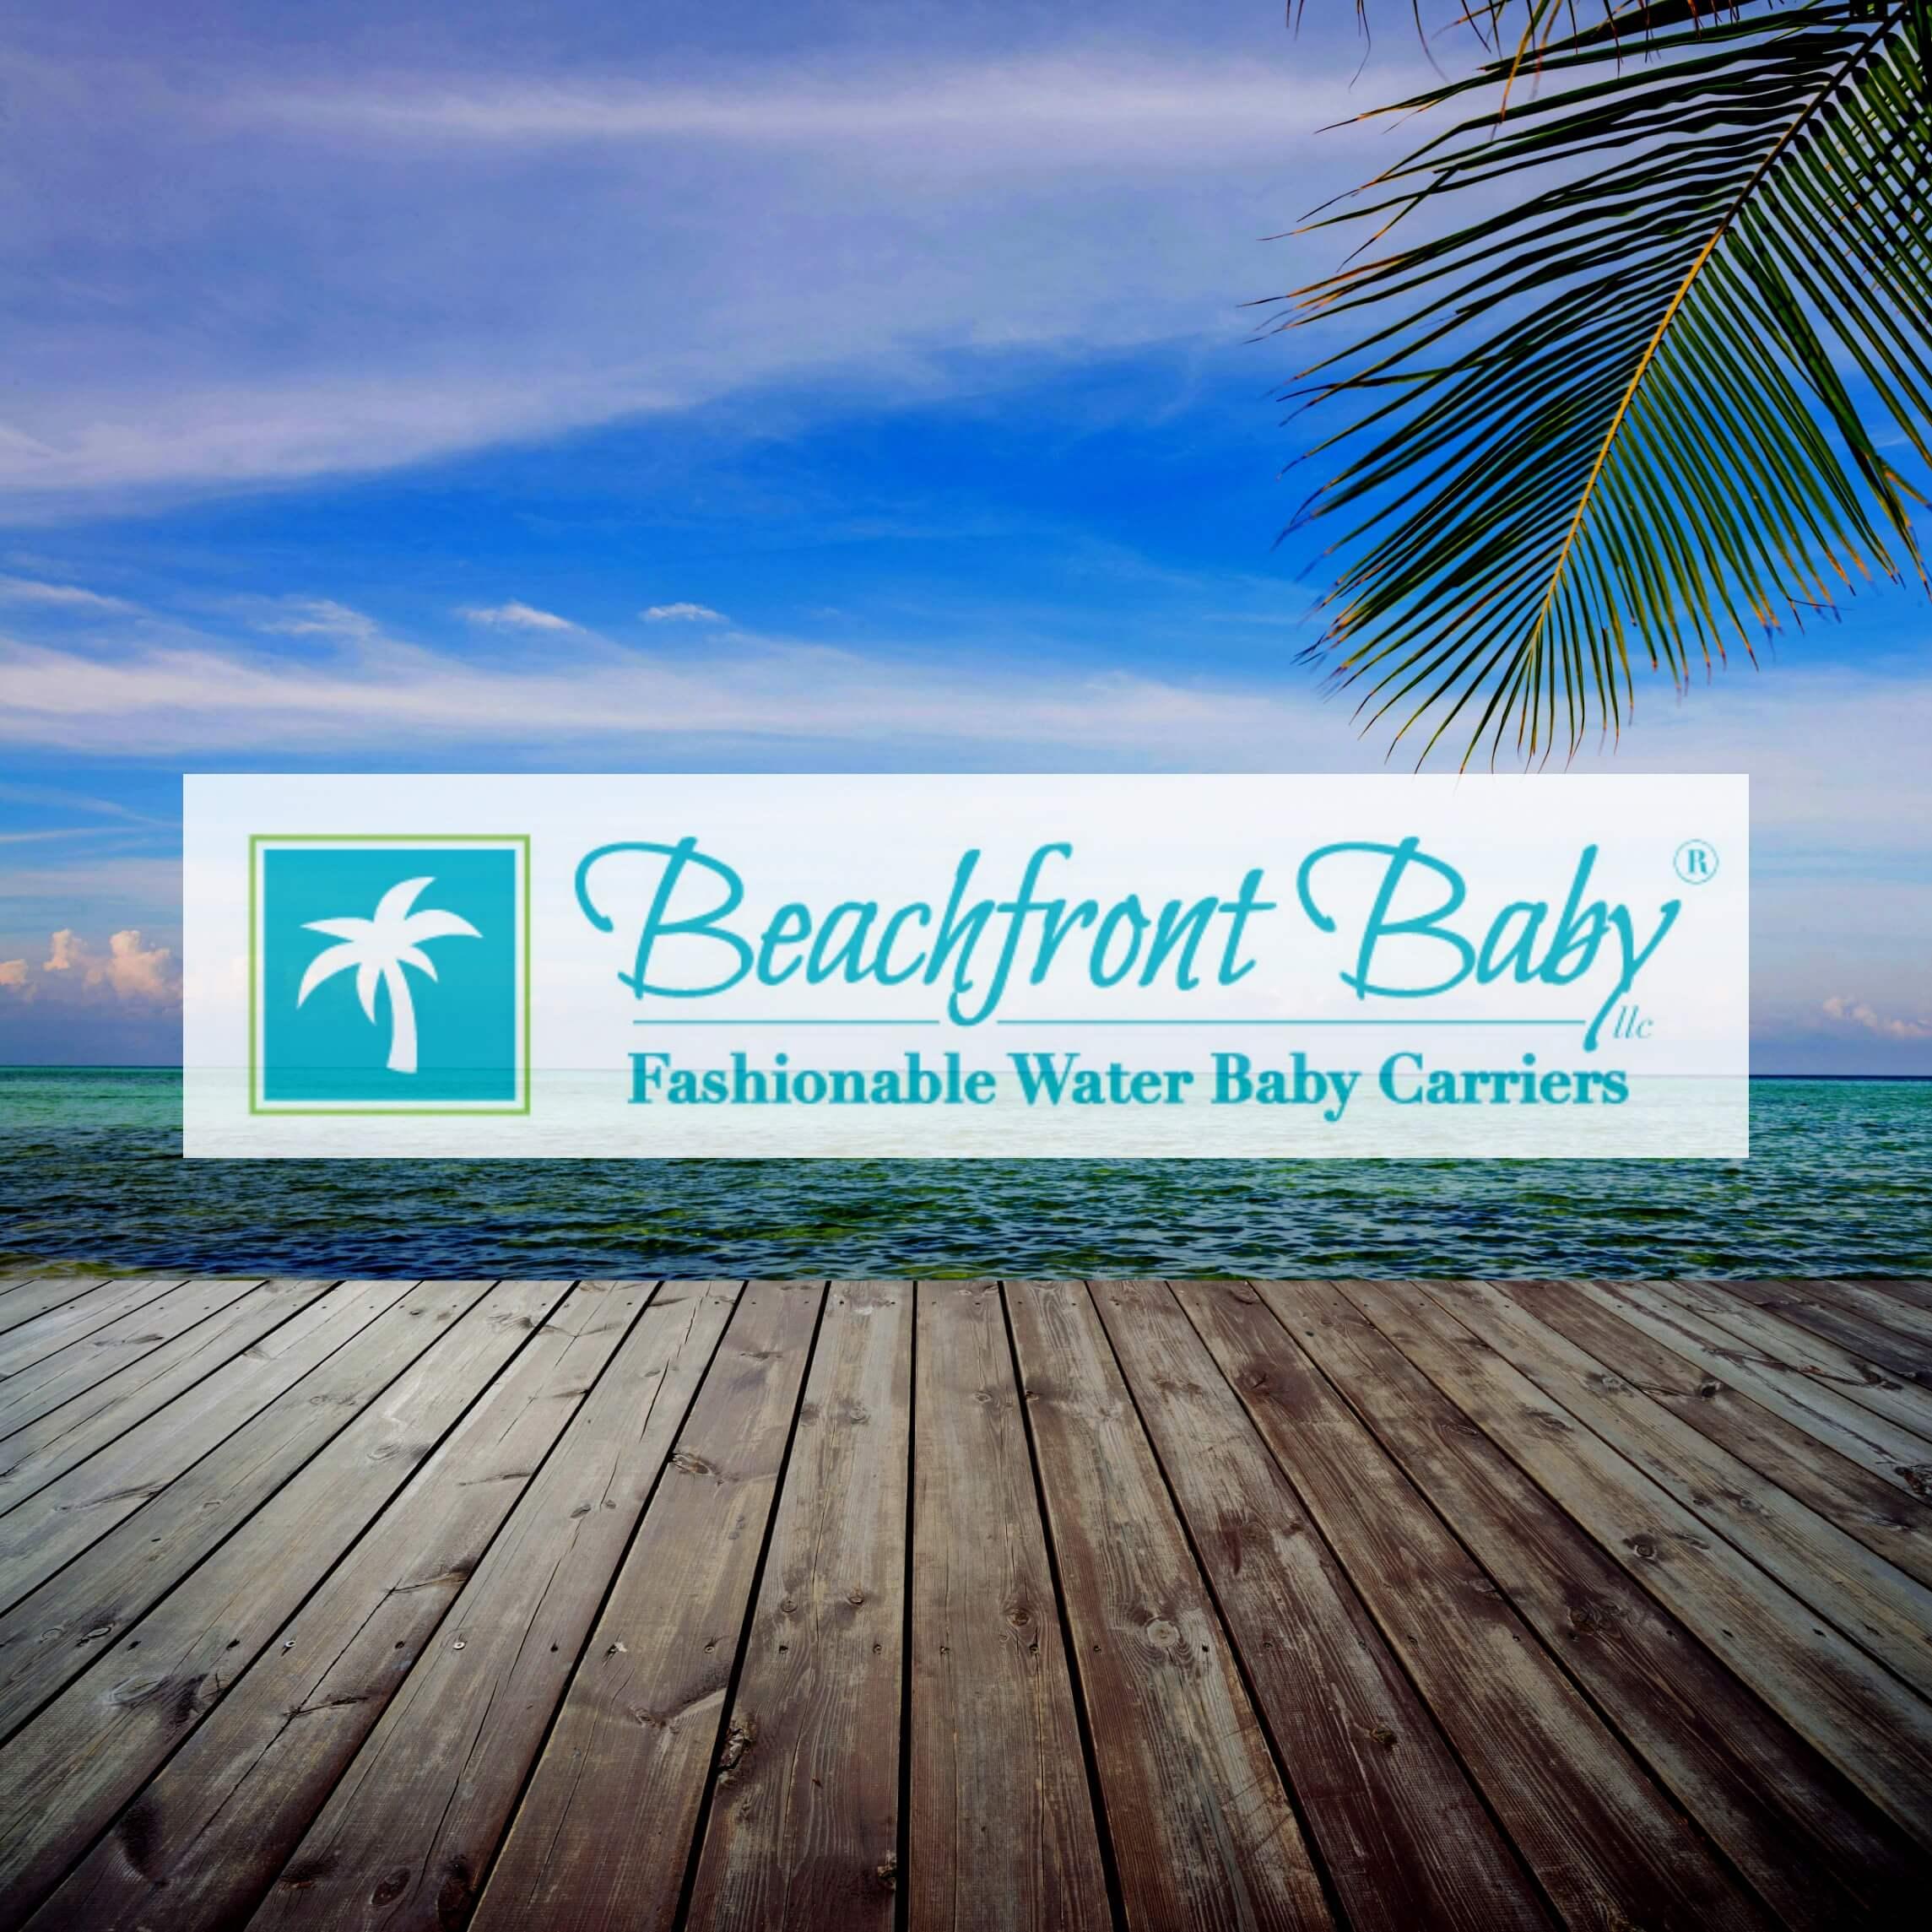 Slings Beachfront Baby Versatile Baby Carriers